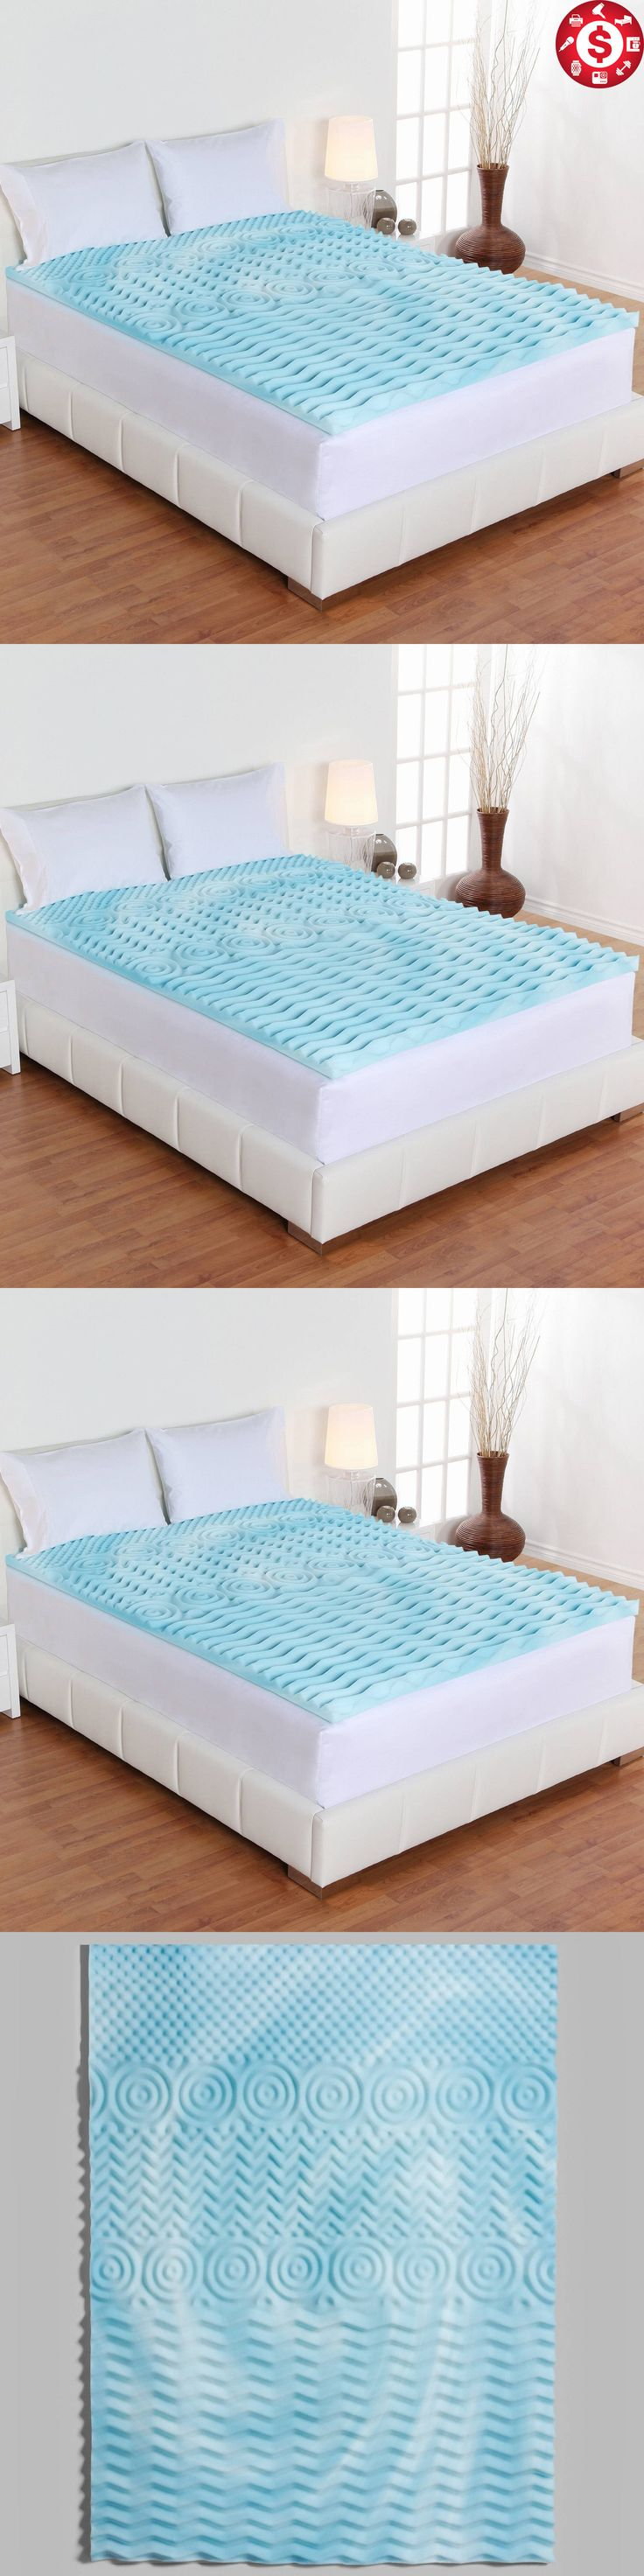 Mattress Pads and Feather Beds 175751: Twin Xl Size Cooling Gel Memory Foam  Mattress Topper